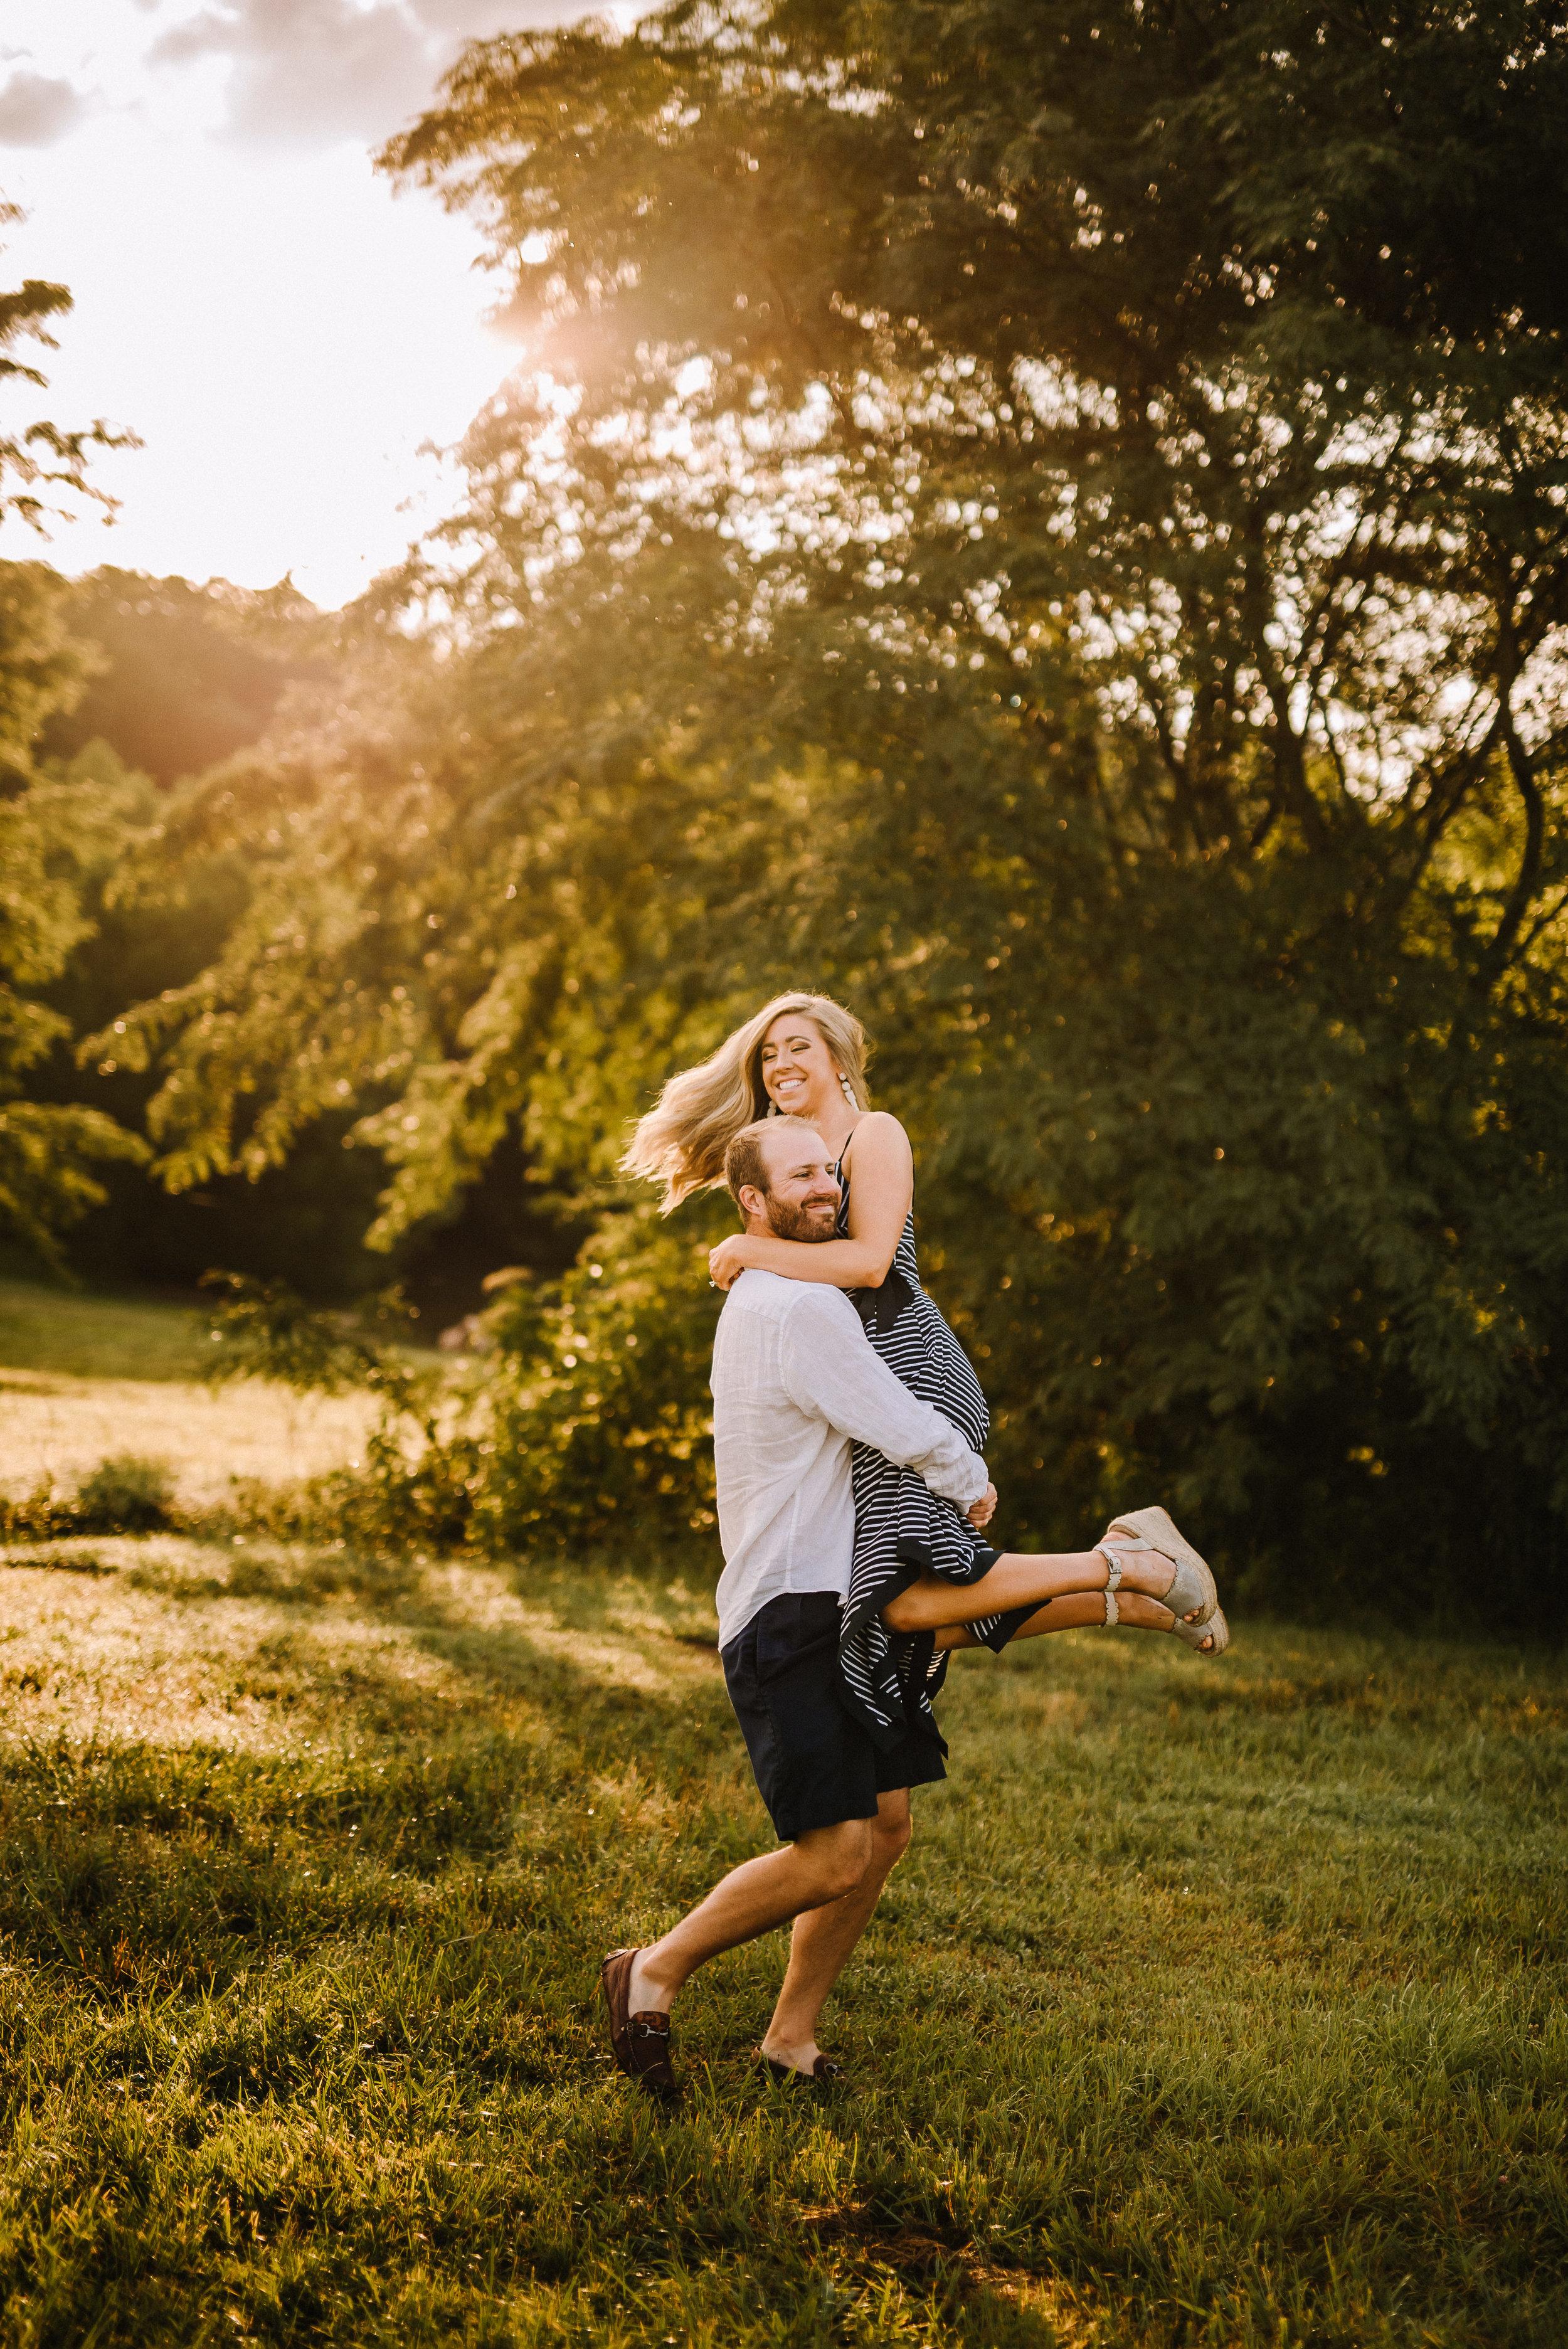 Meredith & Michael_Broad Ave_Shelby Farms_Ashley Benham Photography-155.jpg